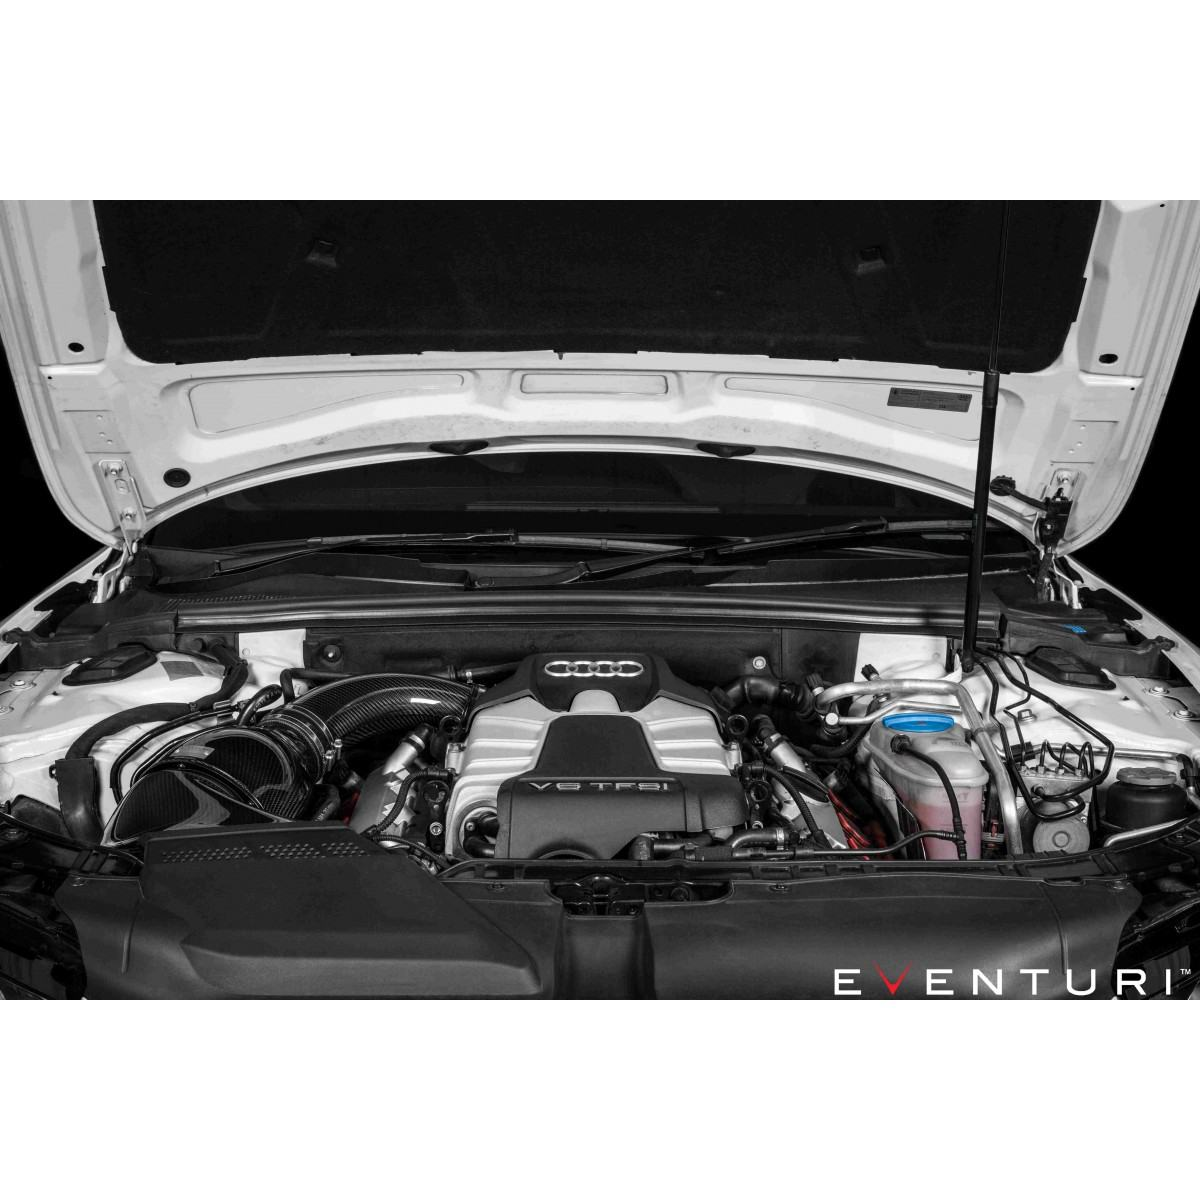 Eventuri Carbon Ansaugung Air Intake Audi S4 S5 3.0TFSI